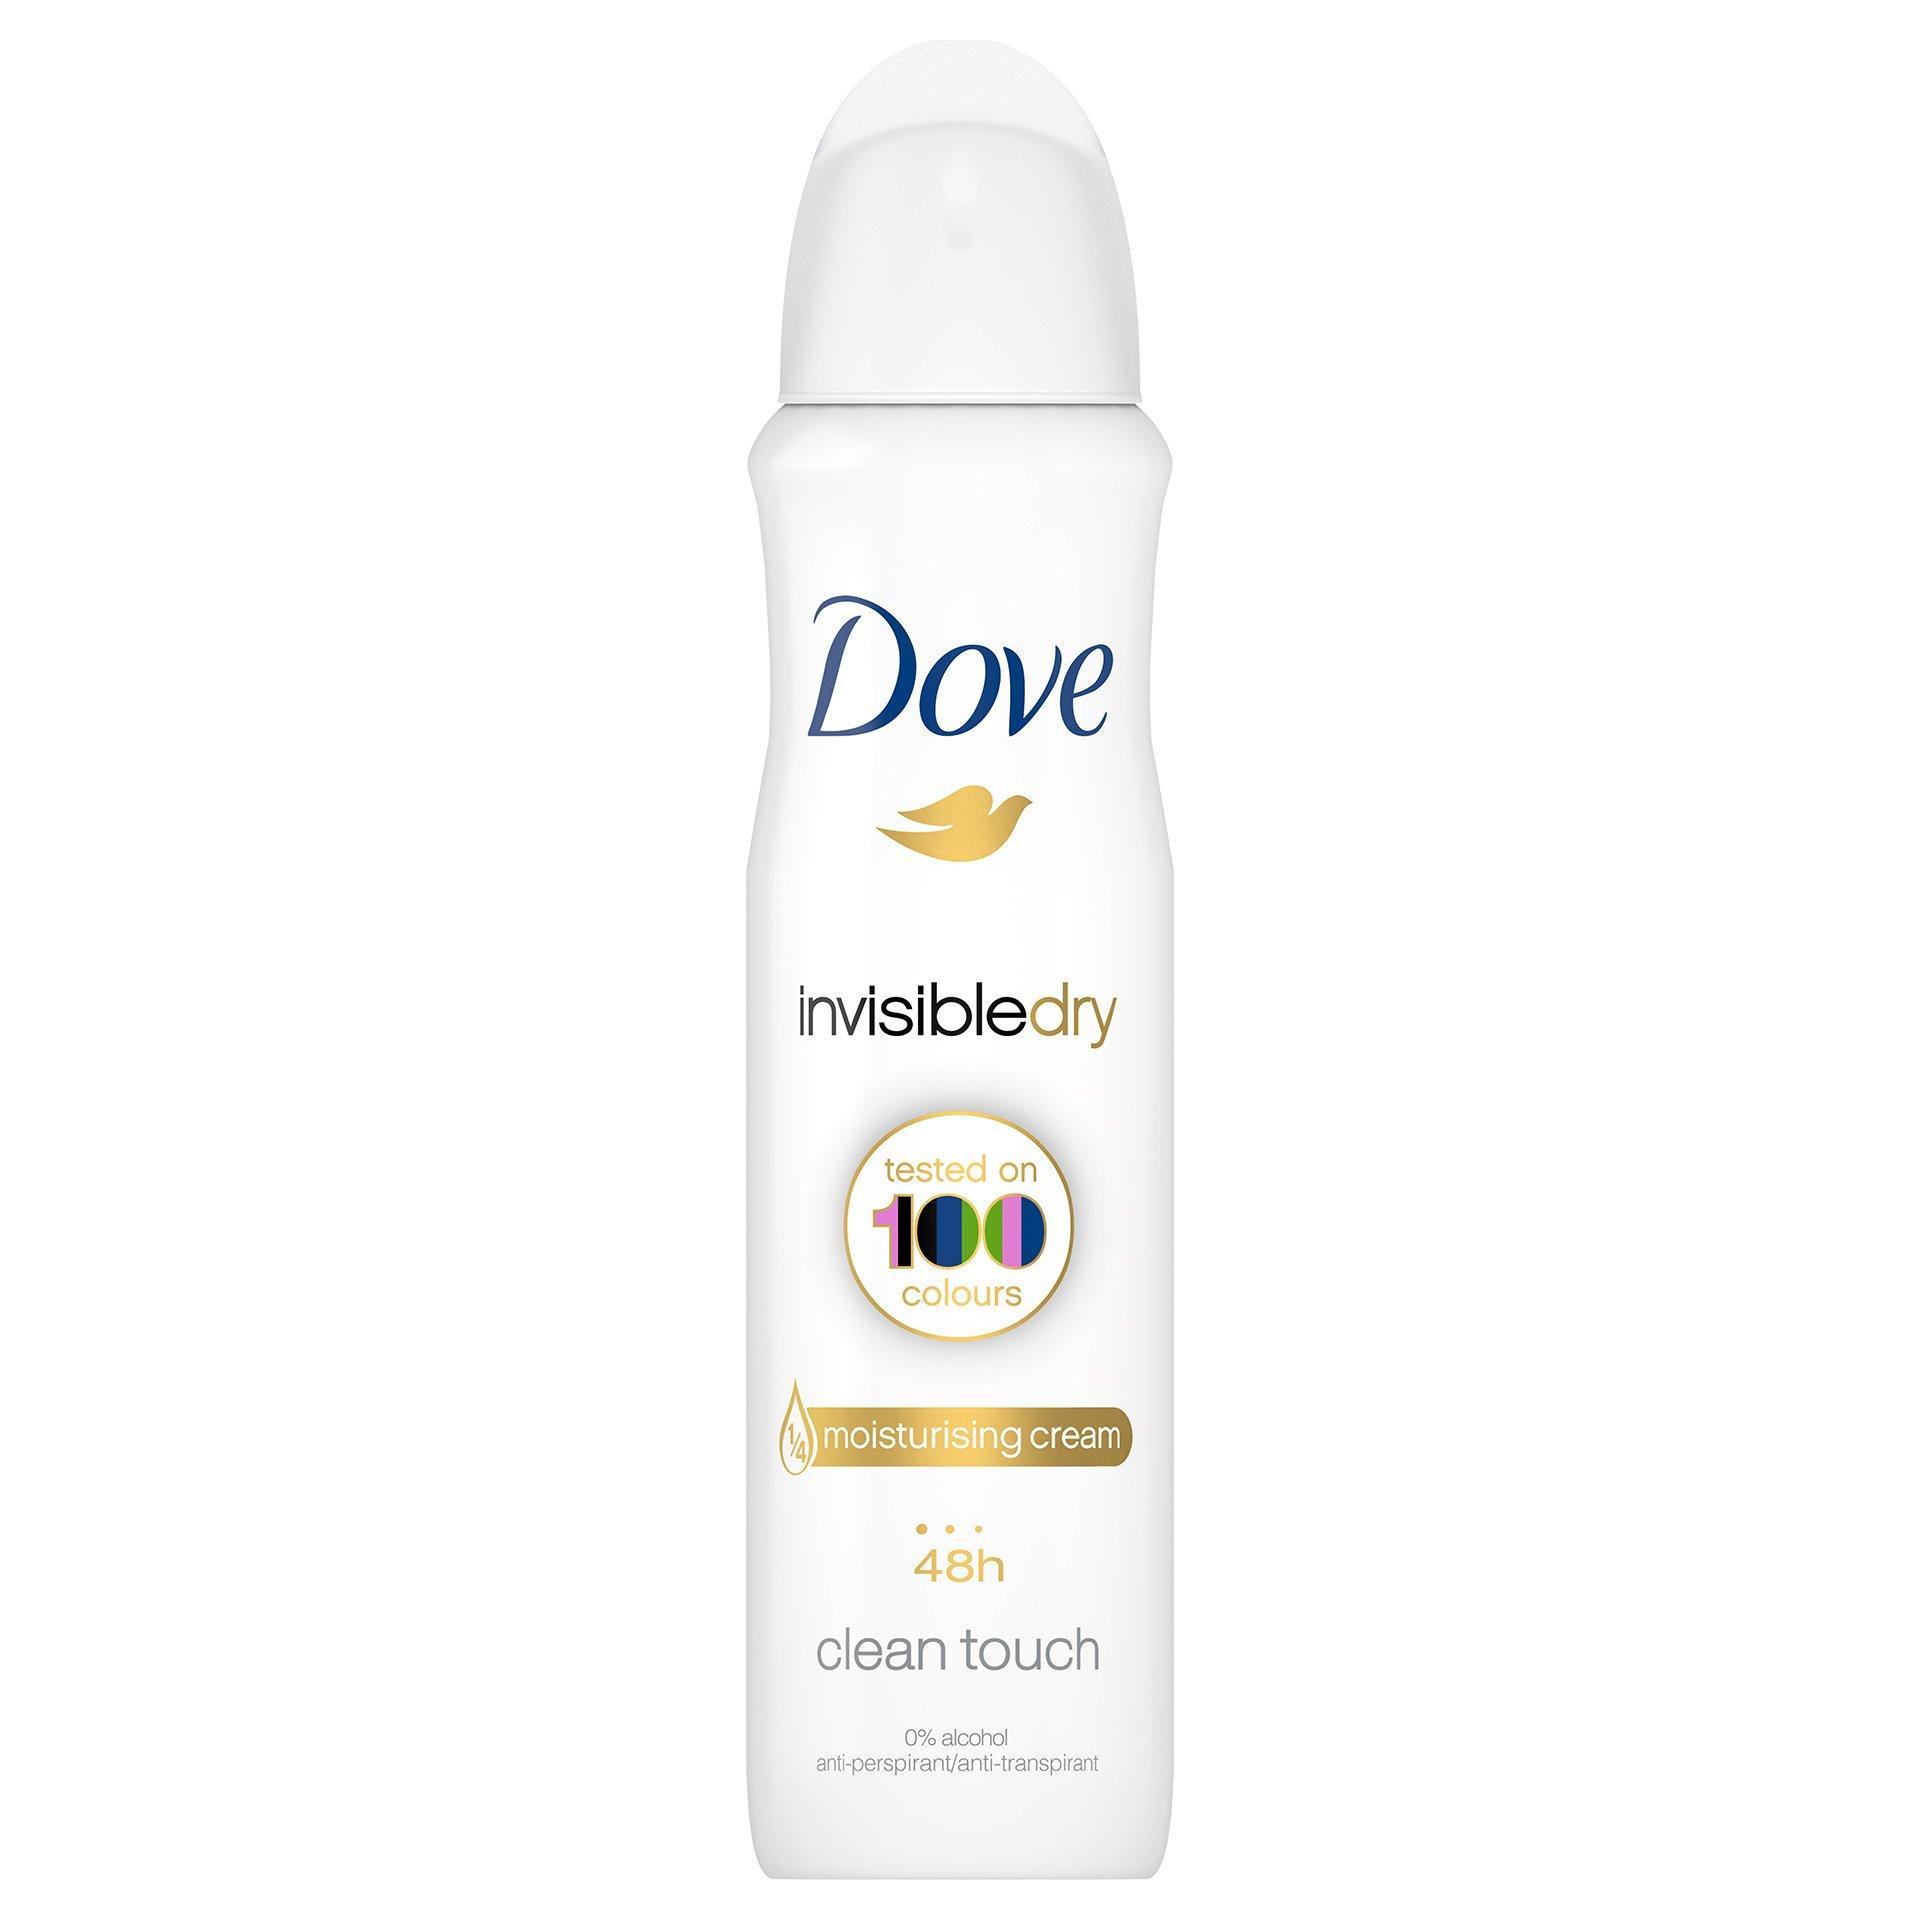 Dove Deo Spray Invisible Dry 48h Clean Touch Αποσμητικό 48ωρης Αντιιδρωτικής Προστασίας Χωρίς Λευκά Σημάδια στα Ρούχα 150ml